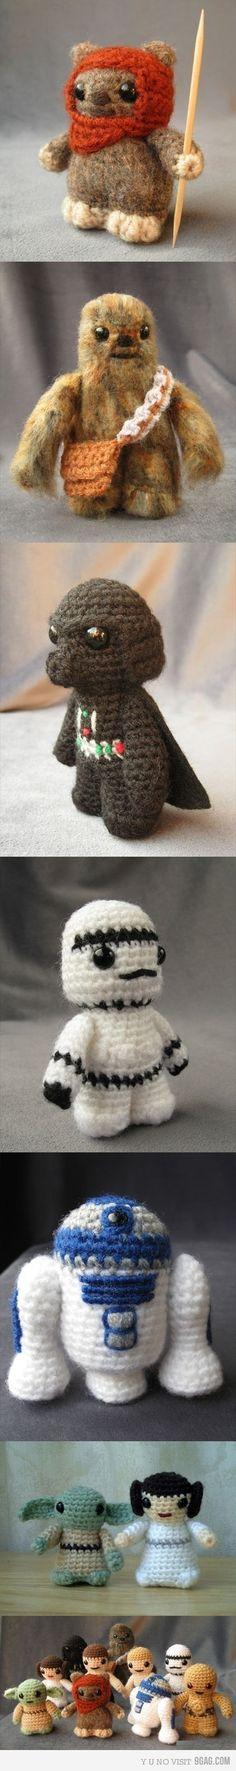 crocheted Star Wars - I want an Ewok!